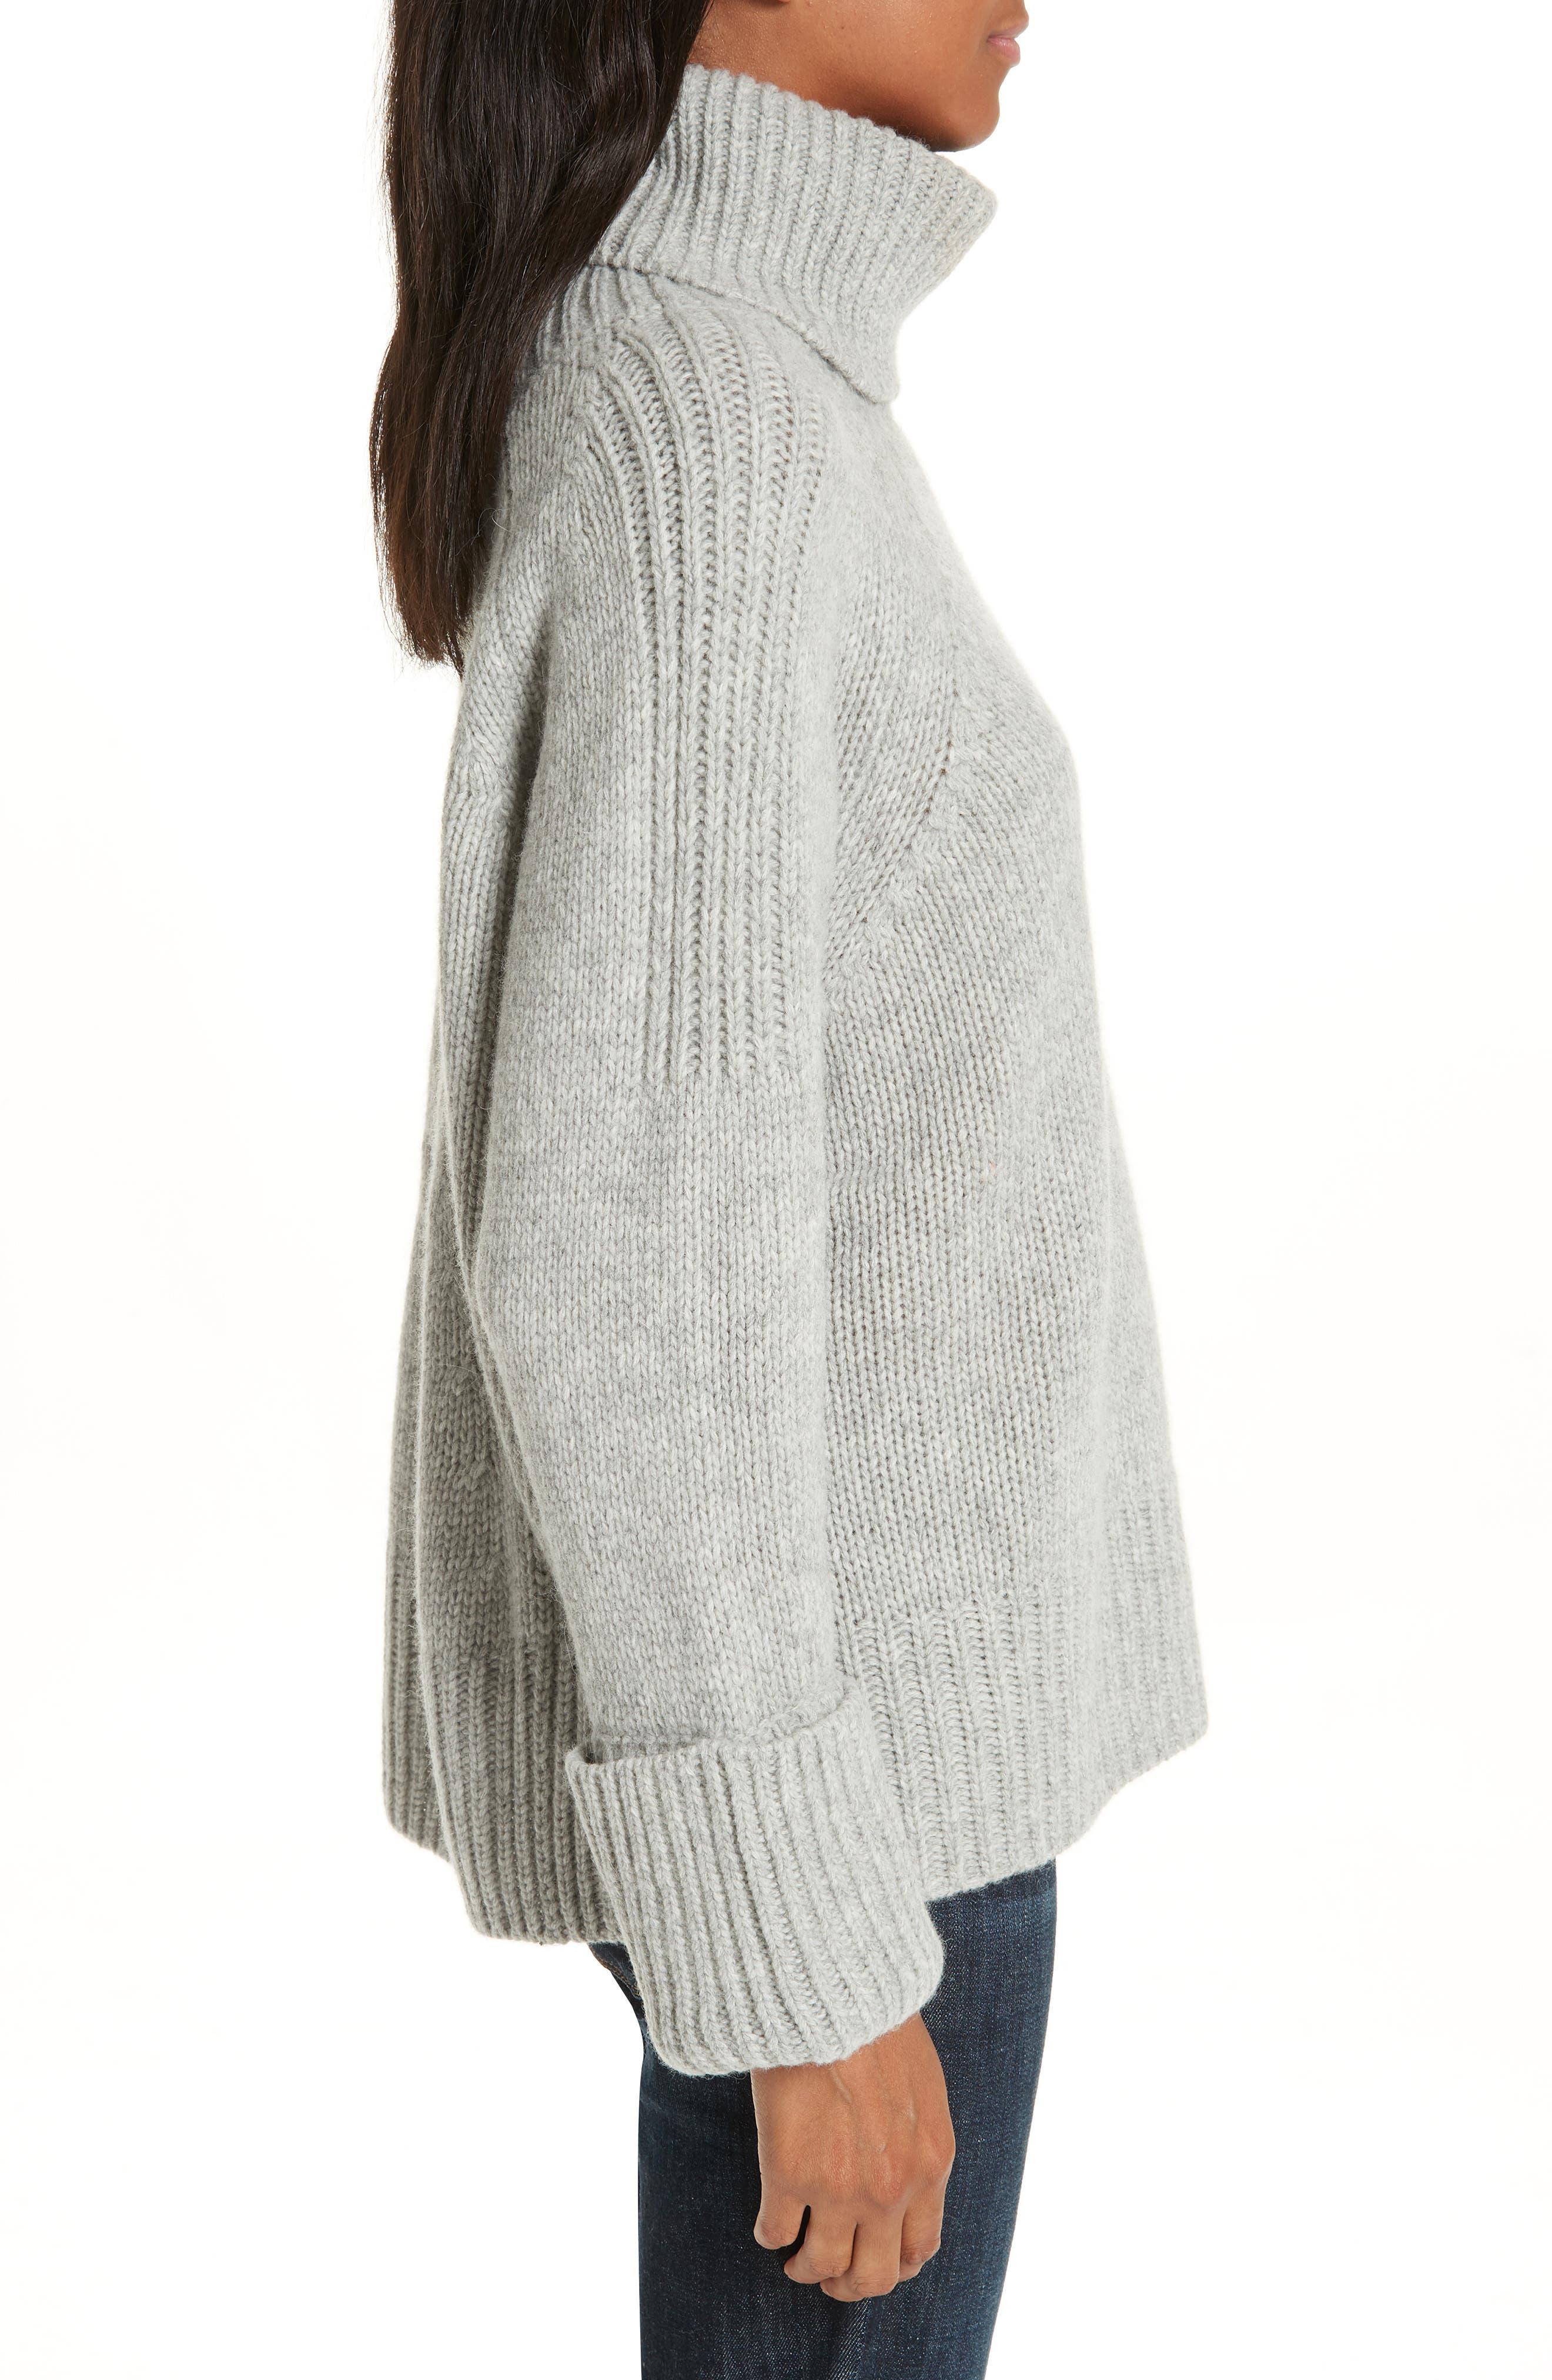 Nagora Sweater,                             Alternate thumbnail 3, color,                             020